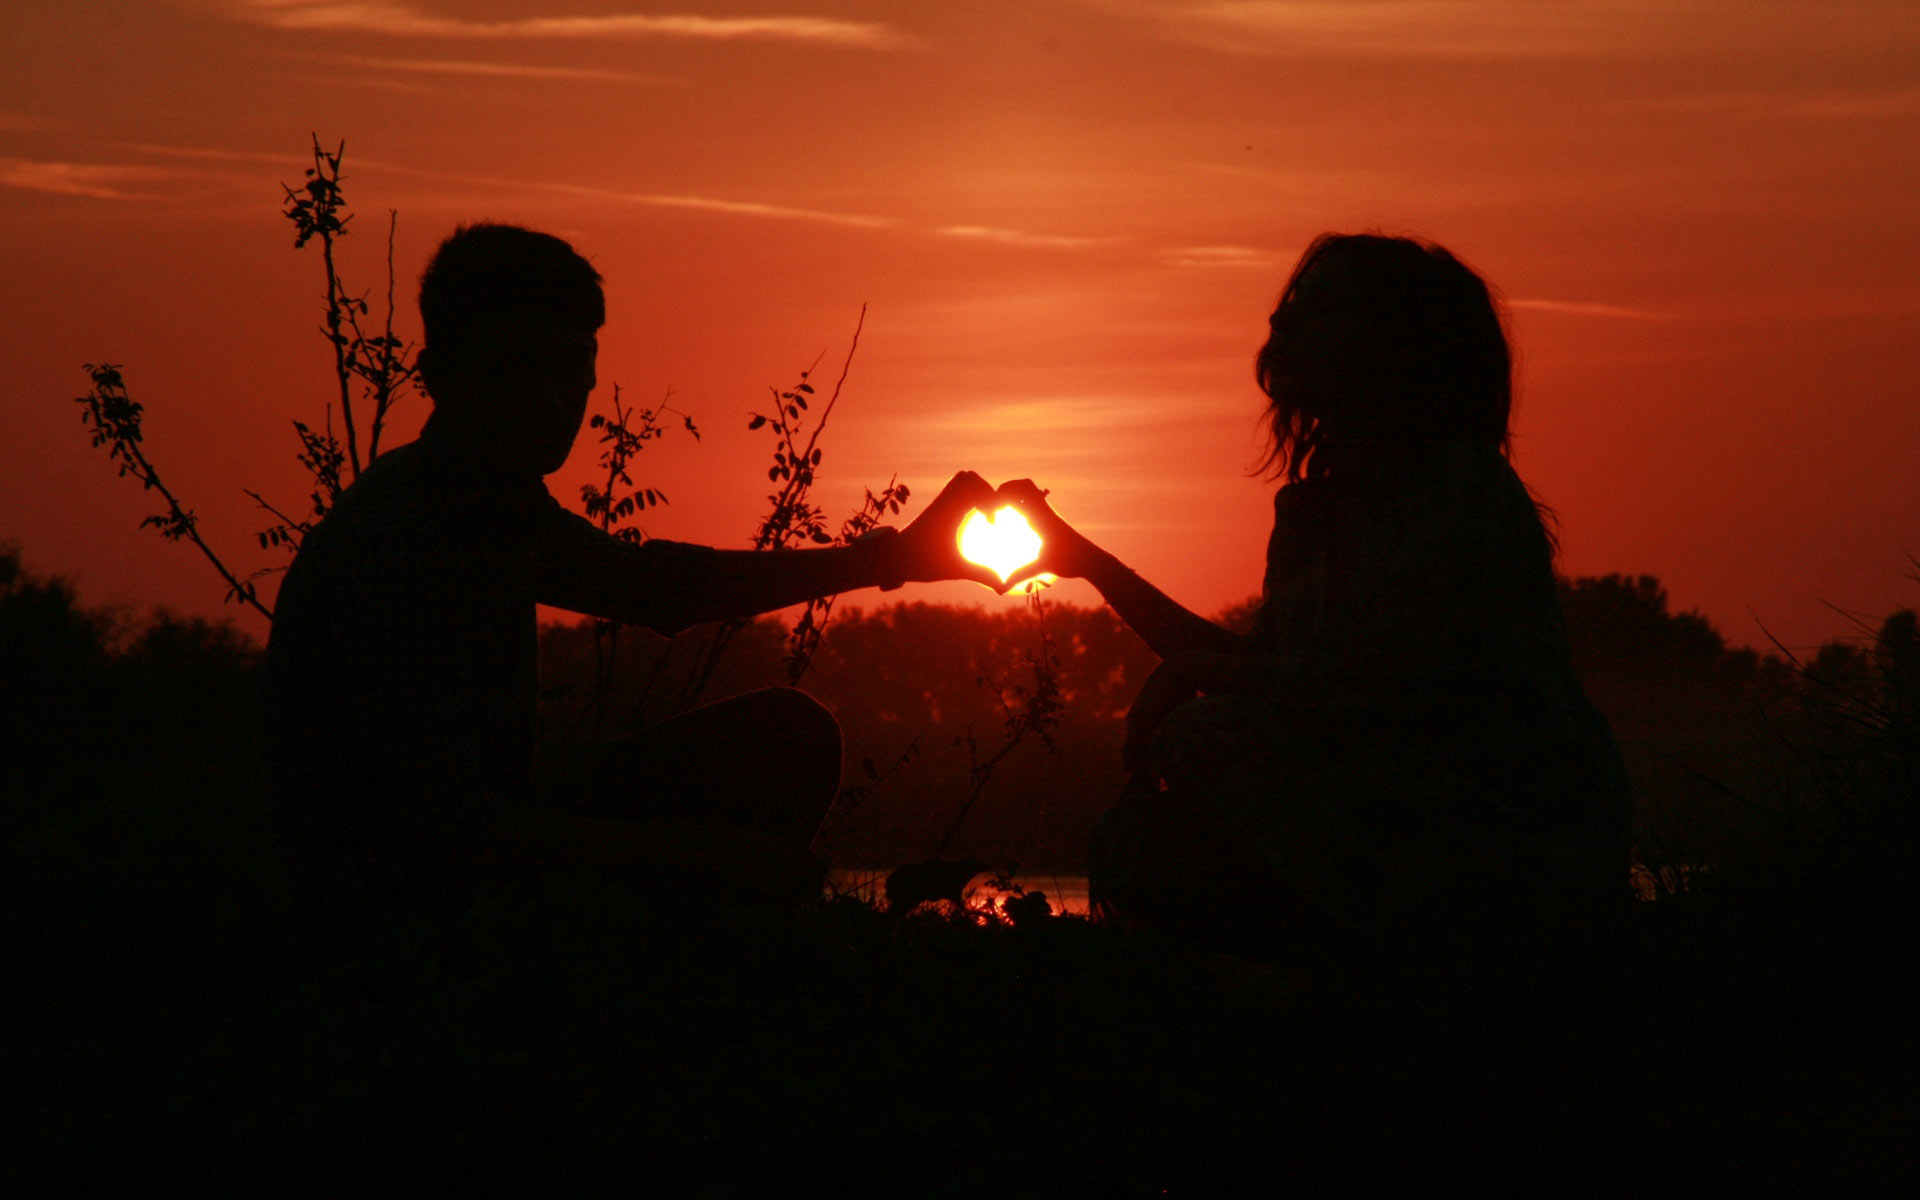 10 New Love Couple Hd Wallpaper Full Hd 1080p For Pc: Imagens Românticas E Apaixonadas